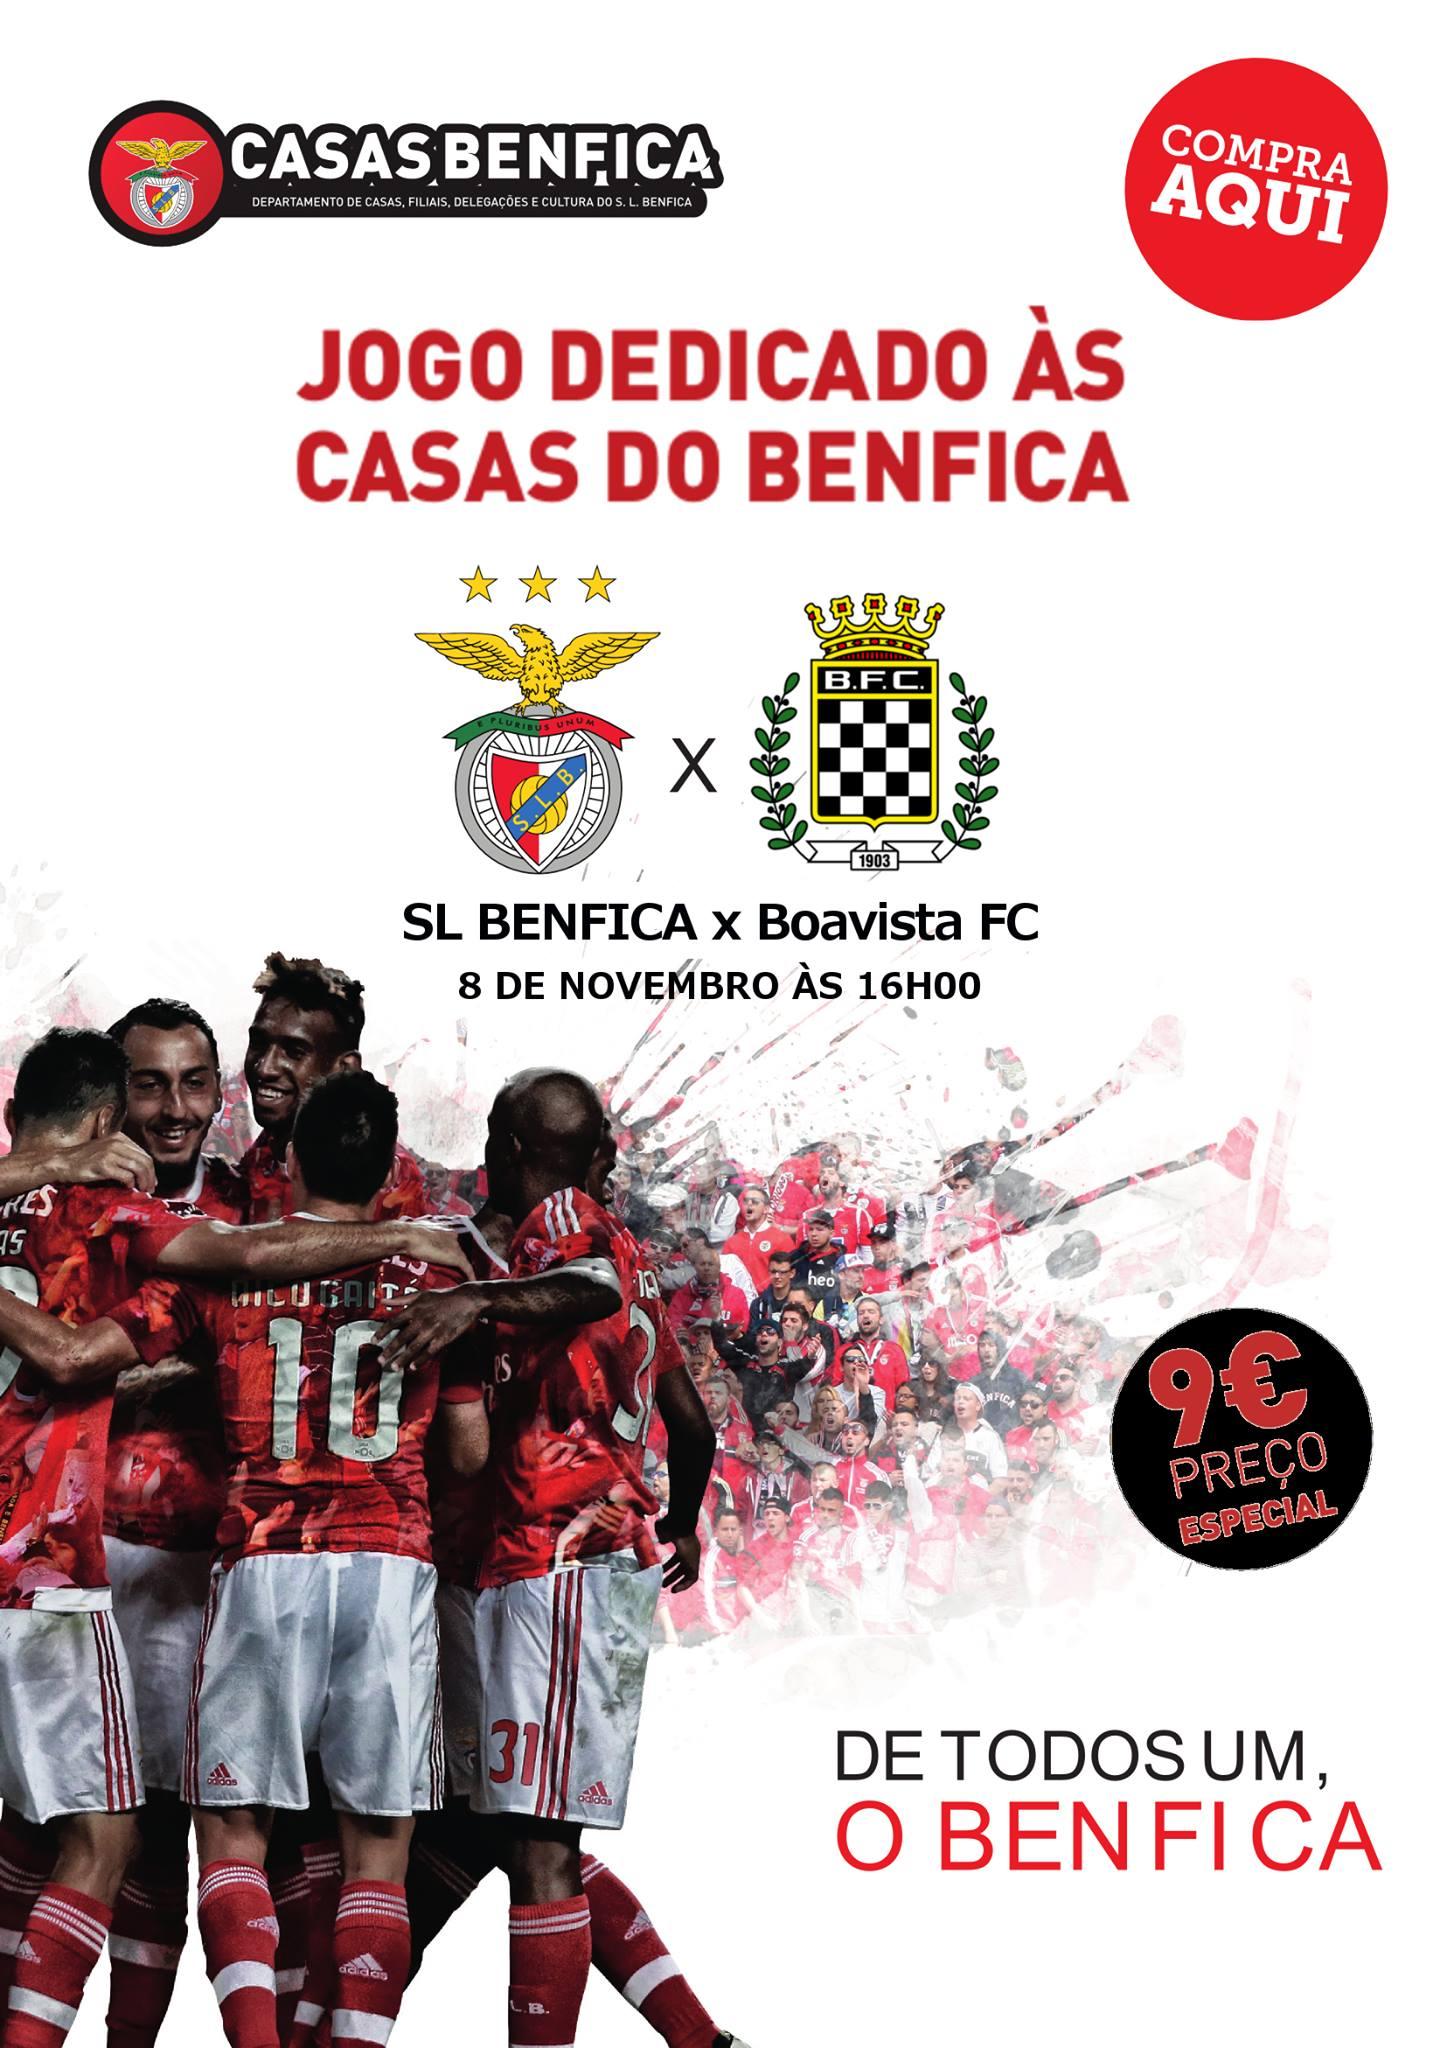 Excursão Benfica x Boavista